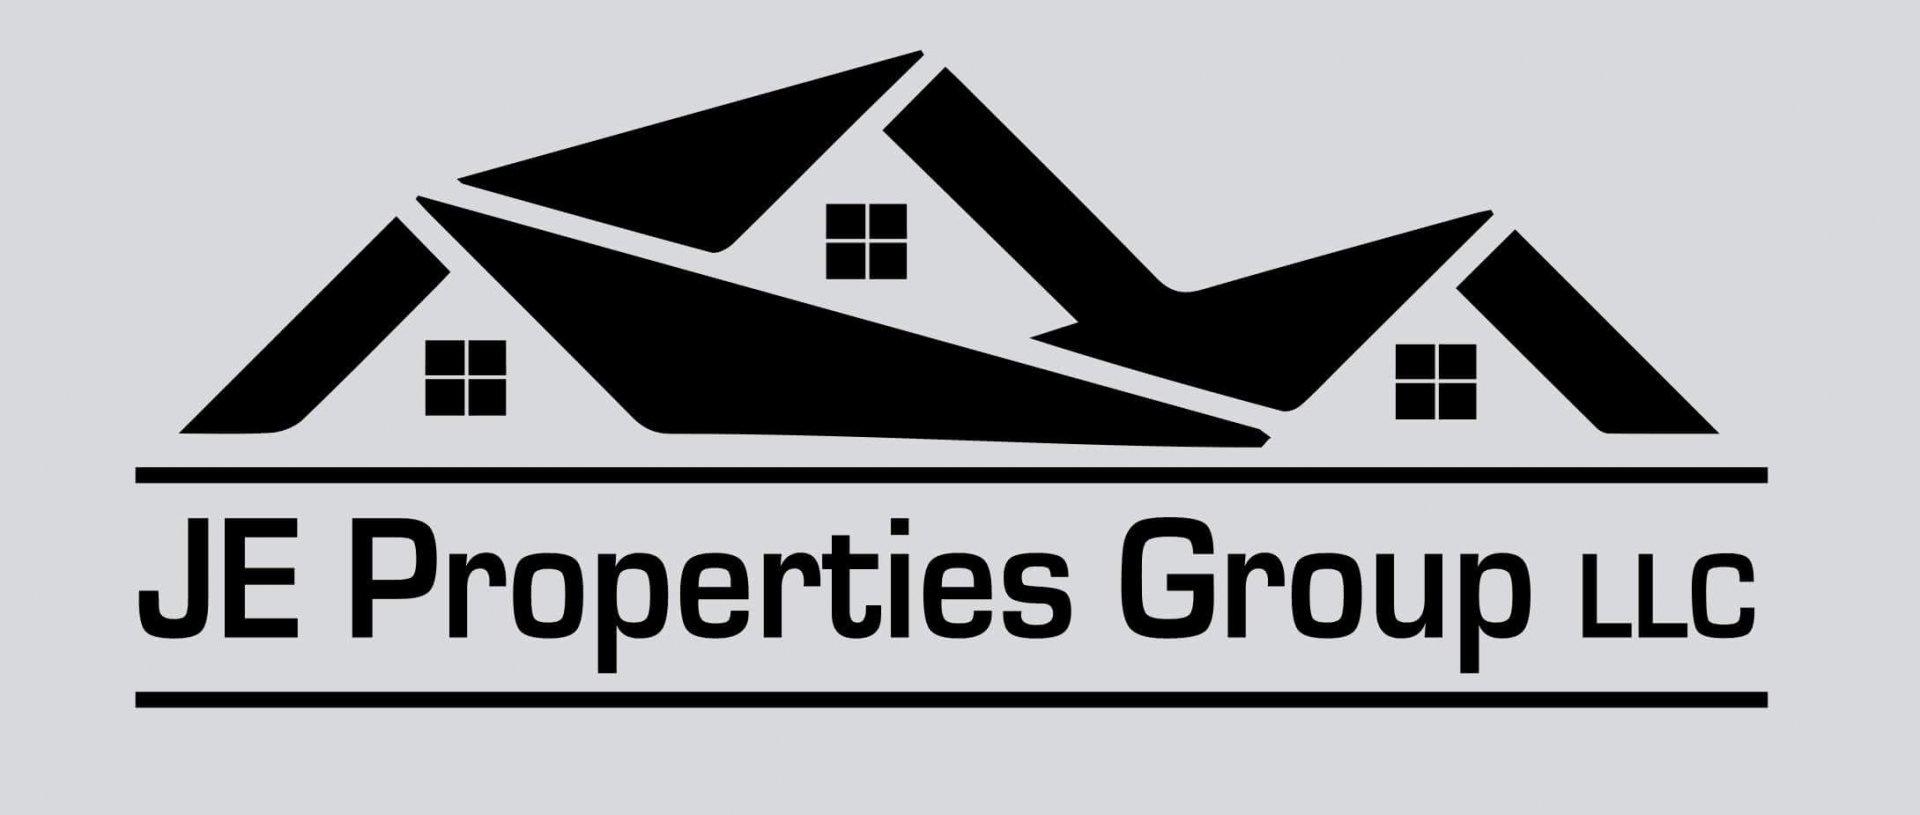 JE Properties Group, LLC  logo